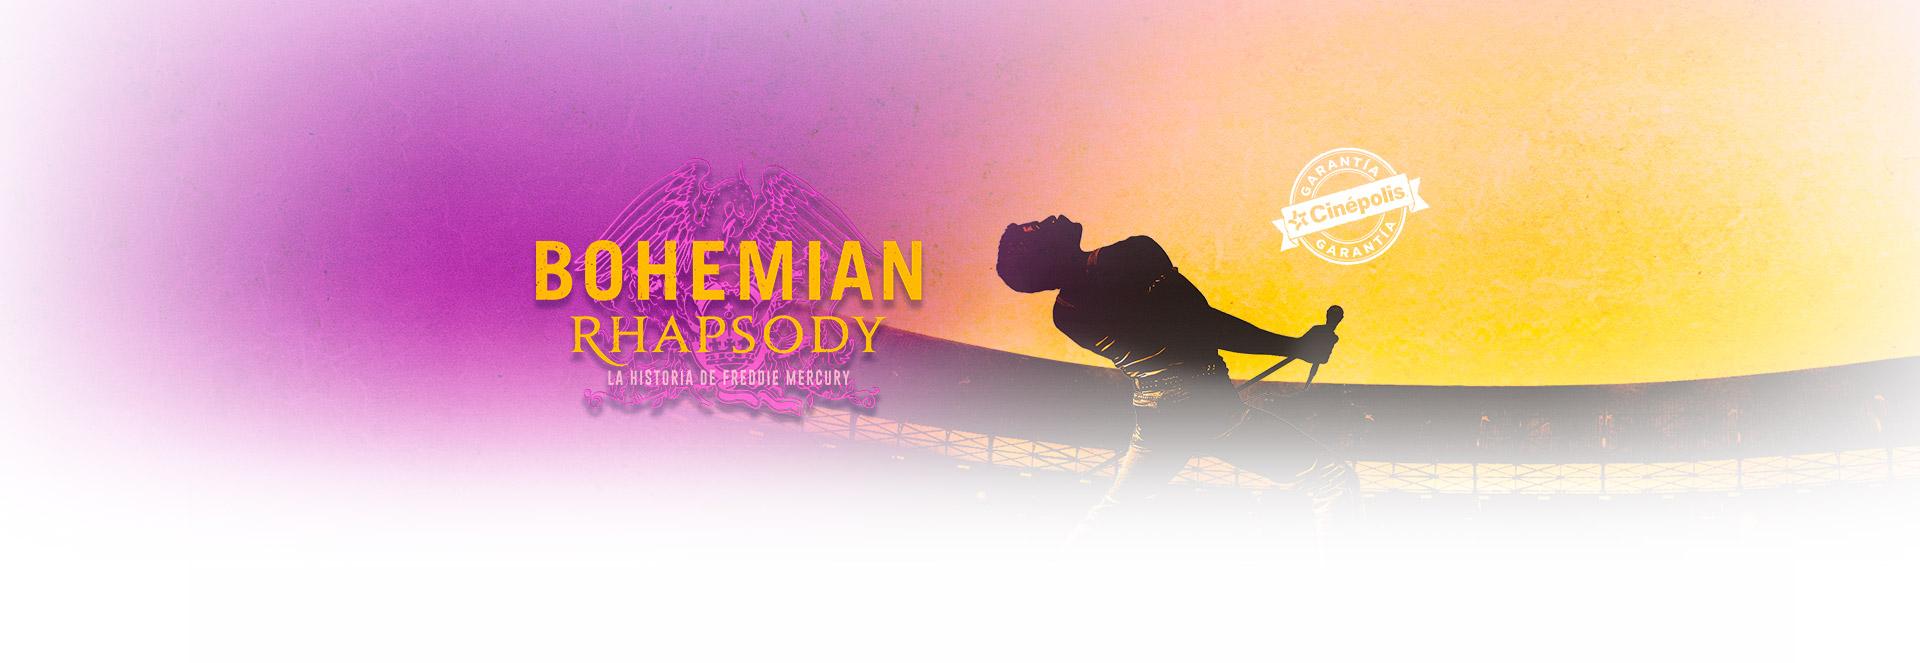 Banner Bohemian Rhapsody | Garantía Cinépolis